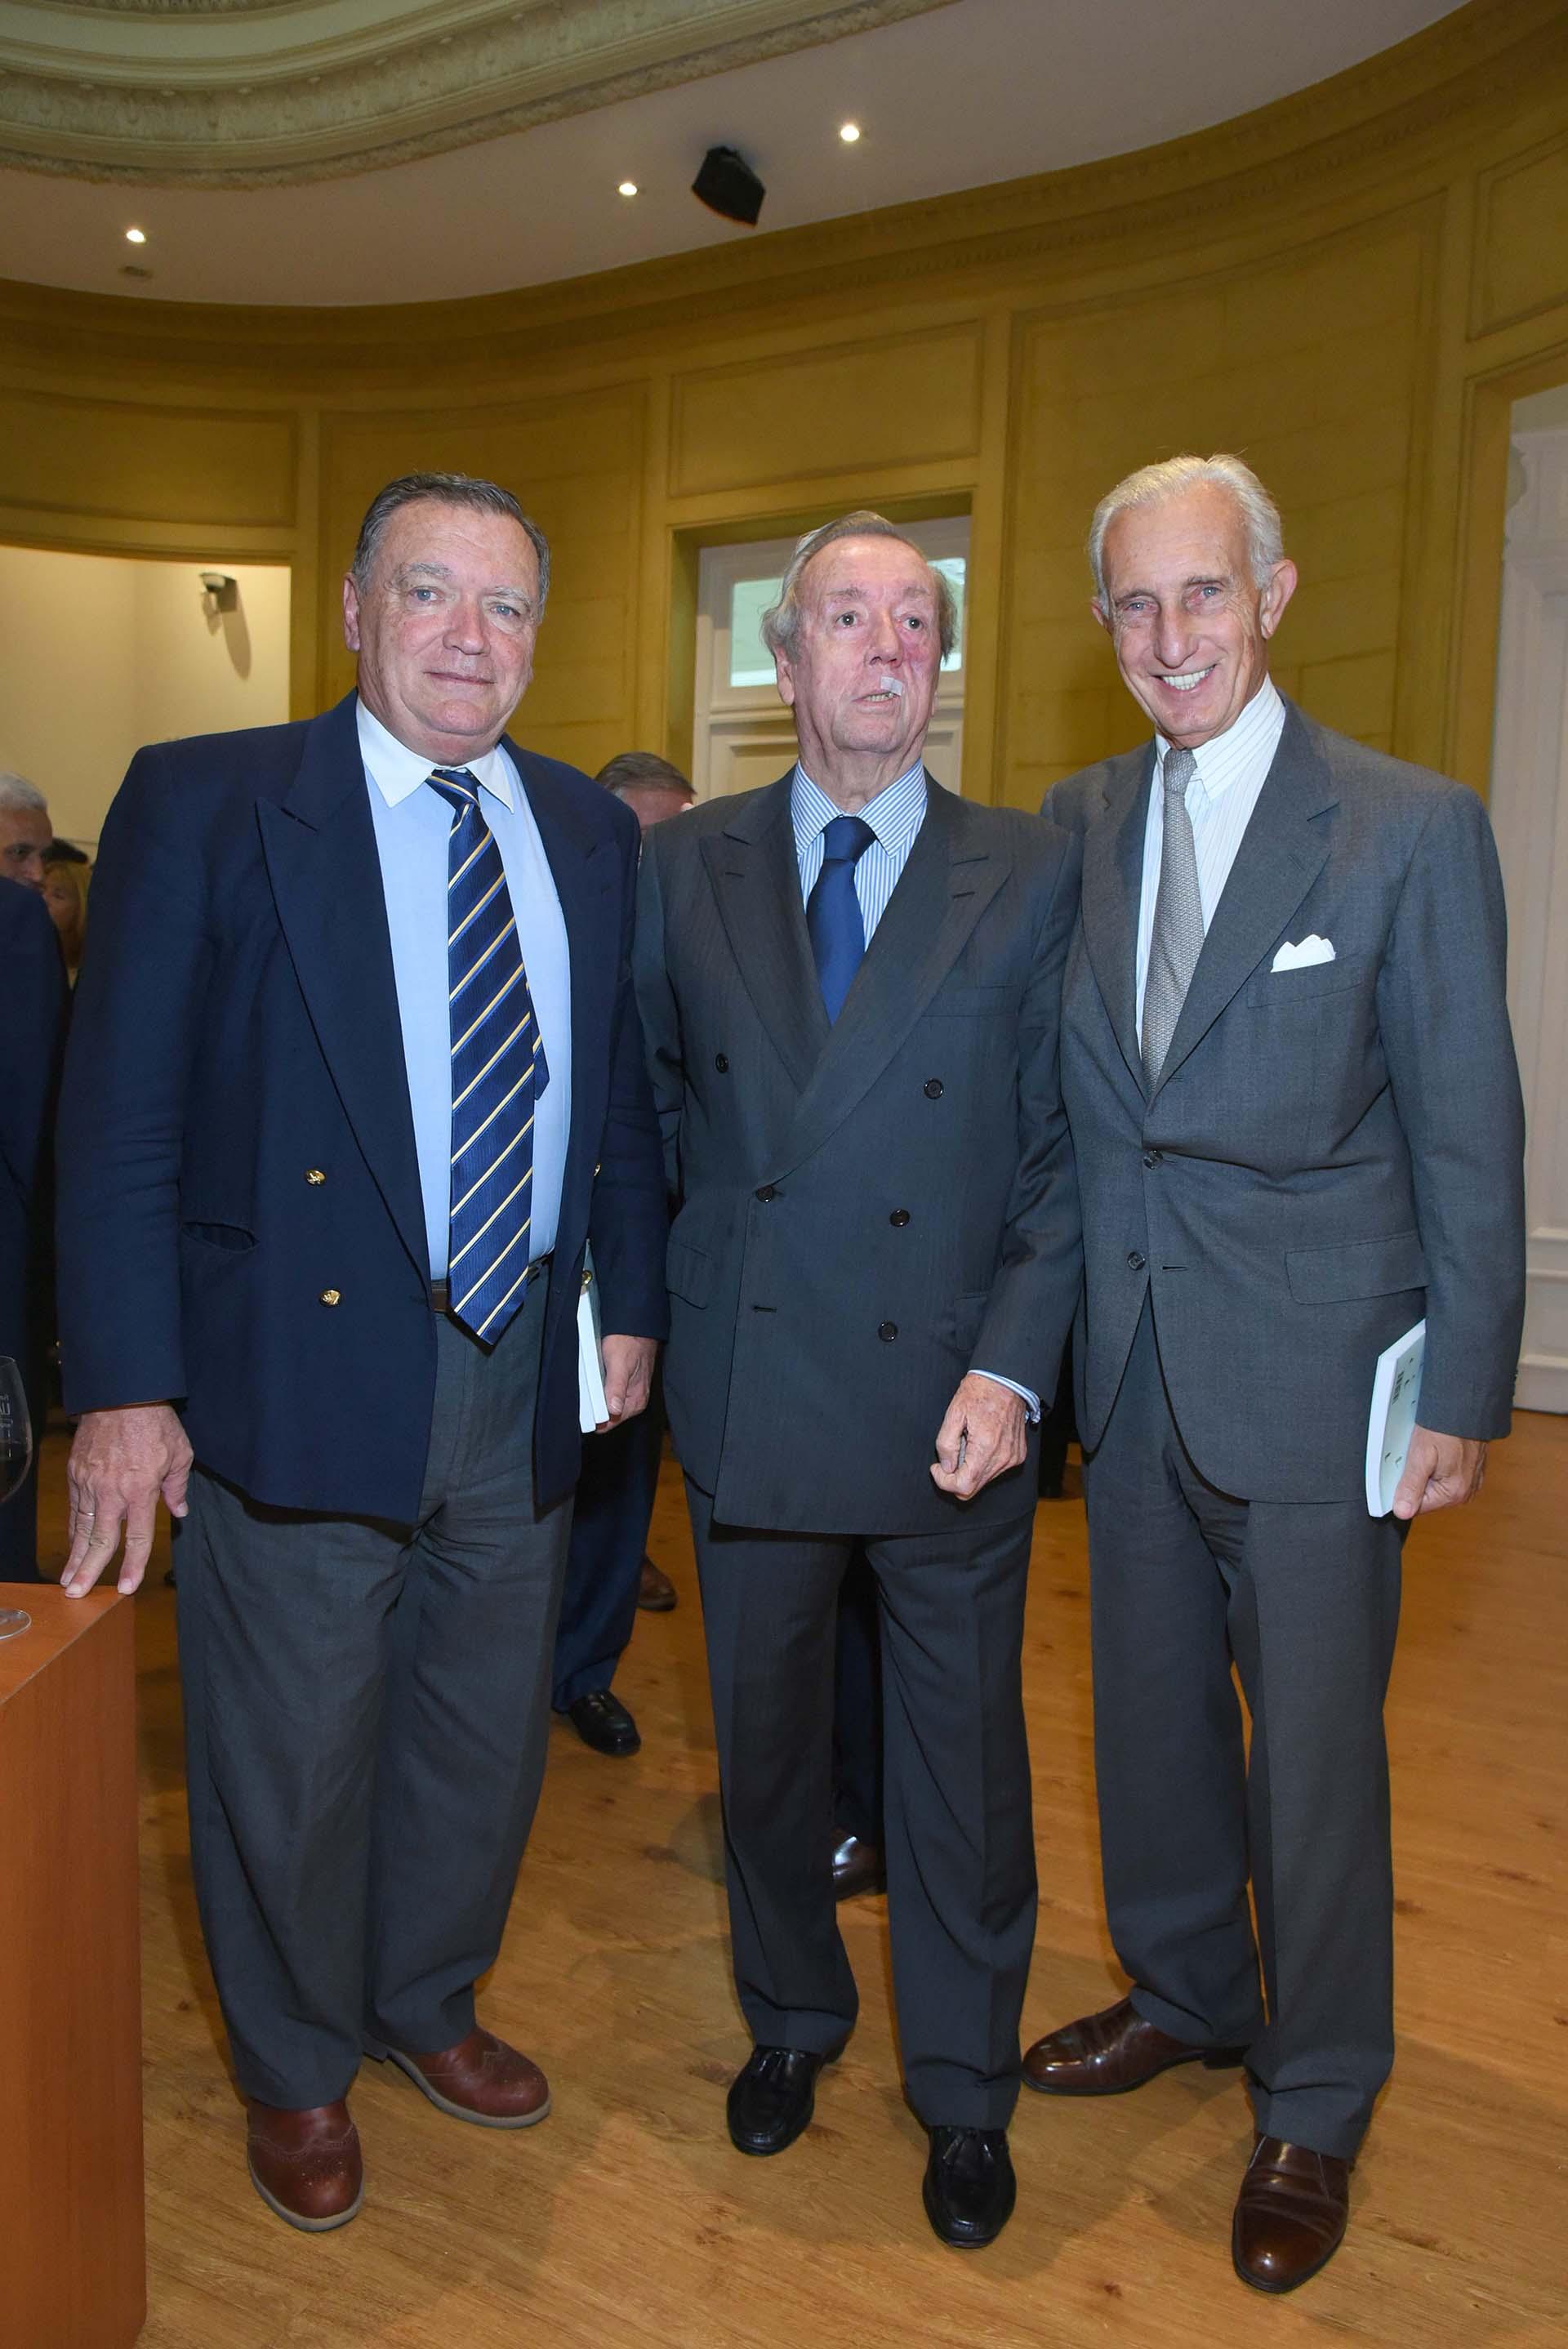 Héctor Laurence, Bruno Quintana y Jorge Neuss